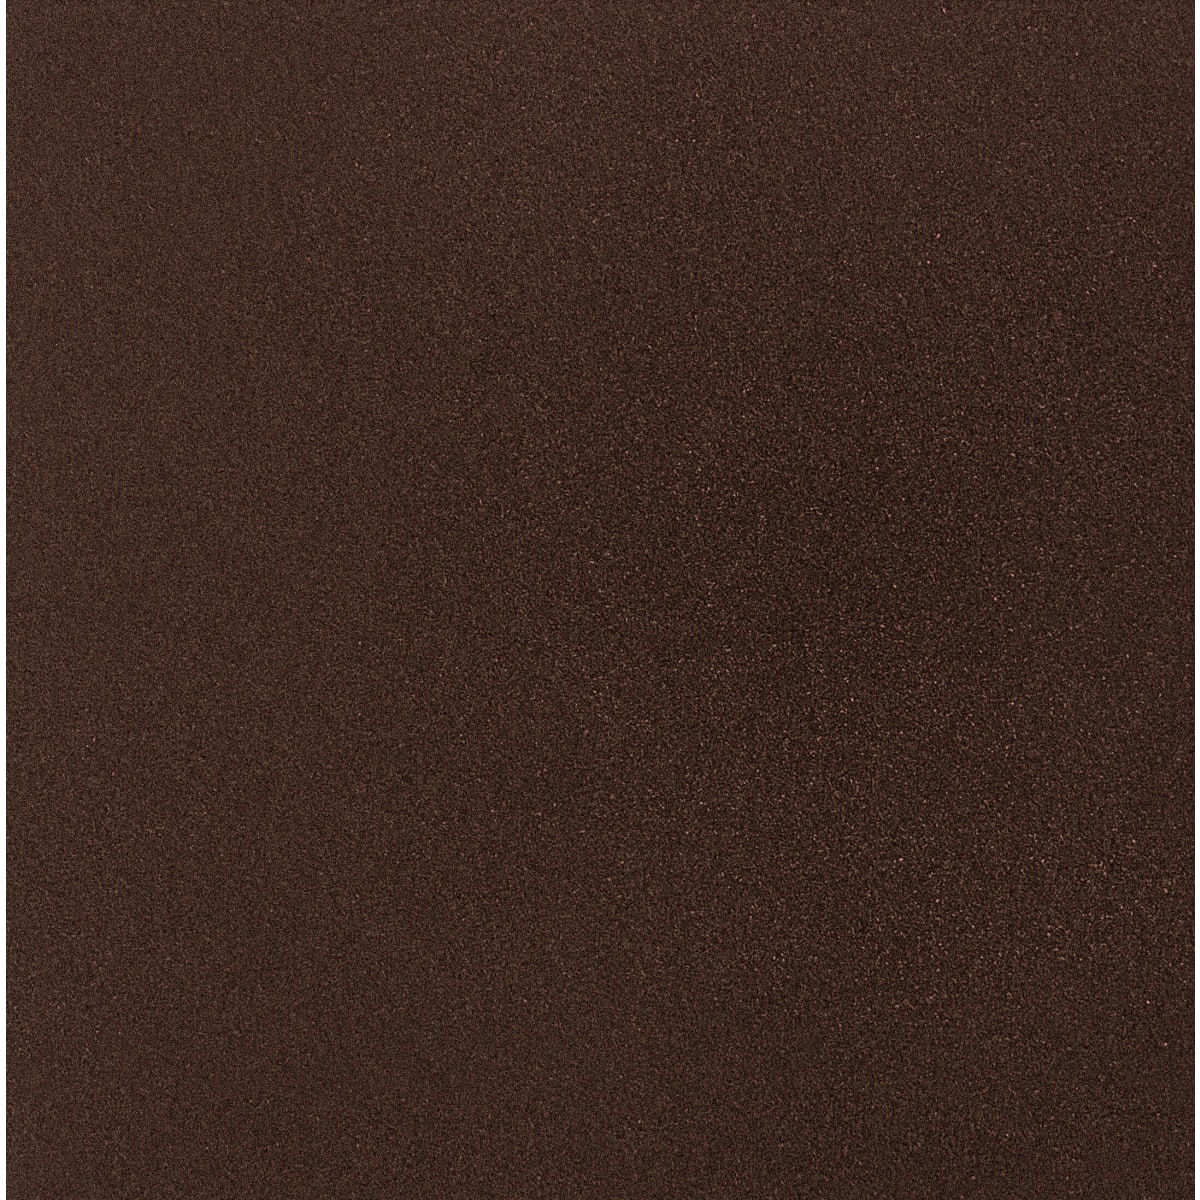 Плитка резиновая 500х500х30 пуансон коричневый